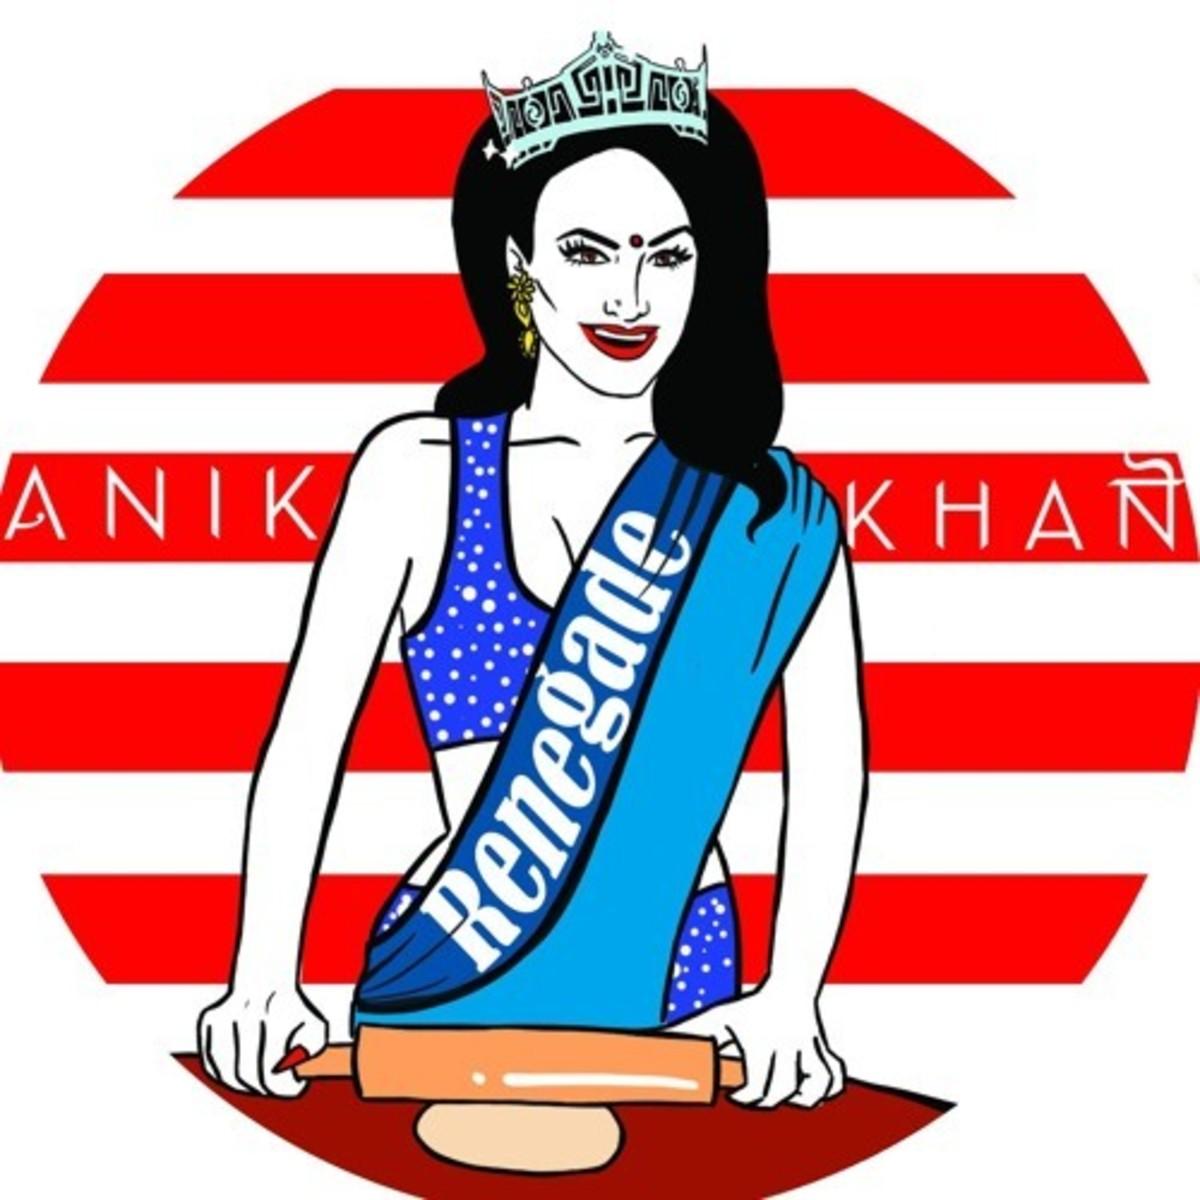 anik-khan-renegade.jpg